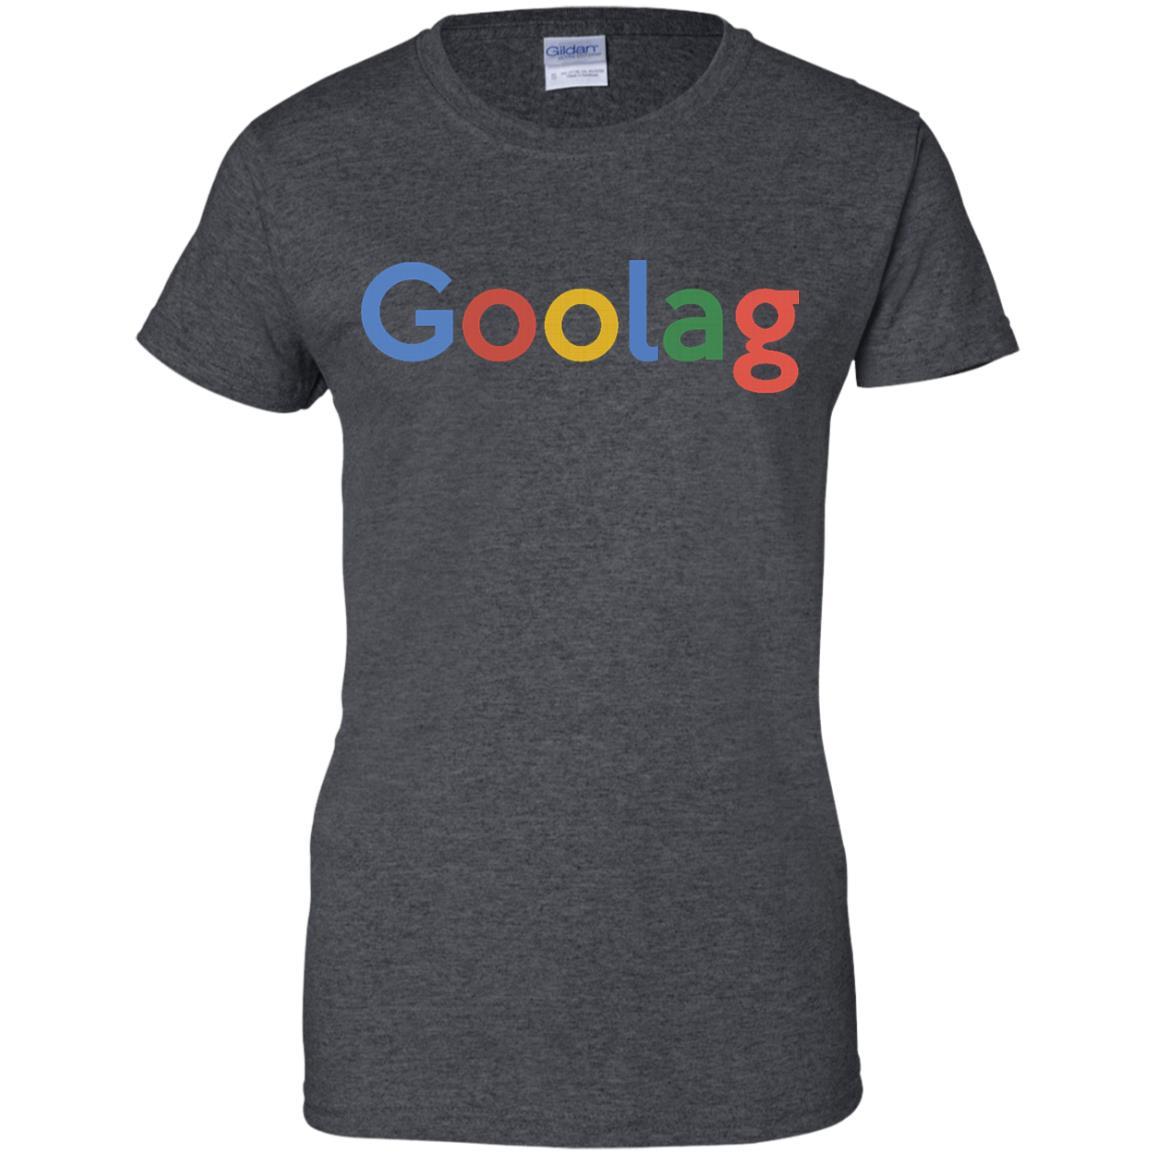 image 290px Googlag T Shirt, Hoodies, Tank Top